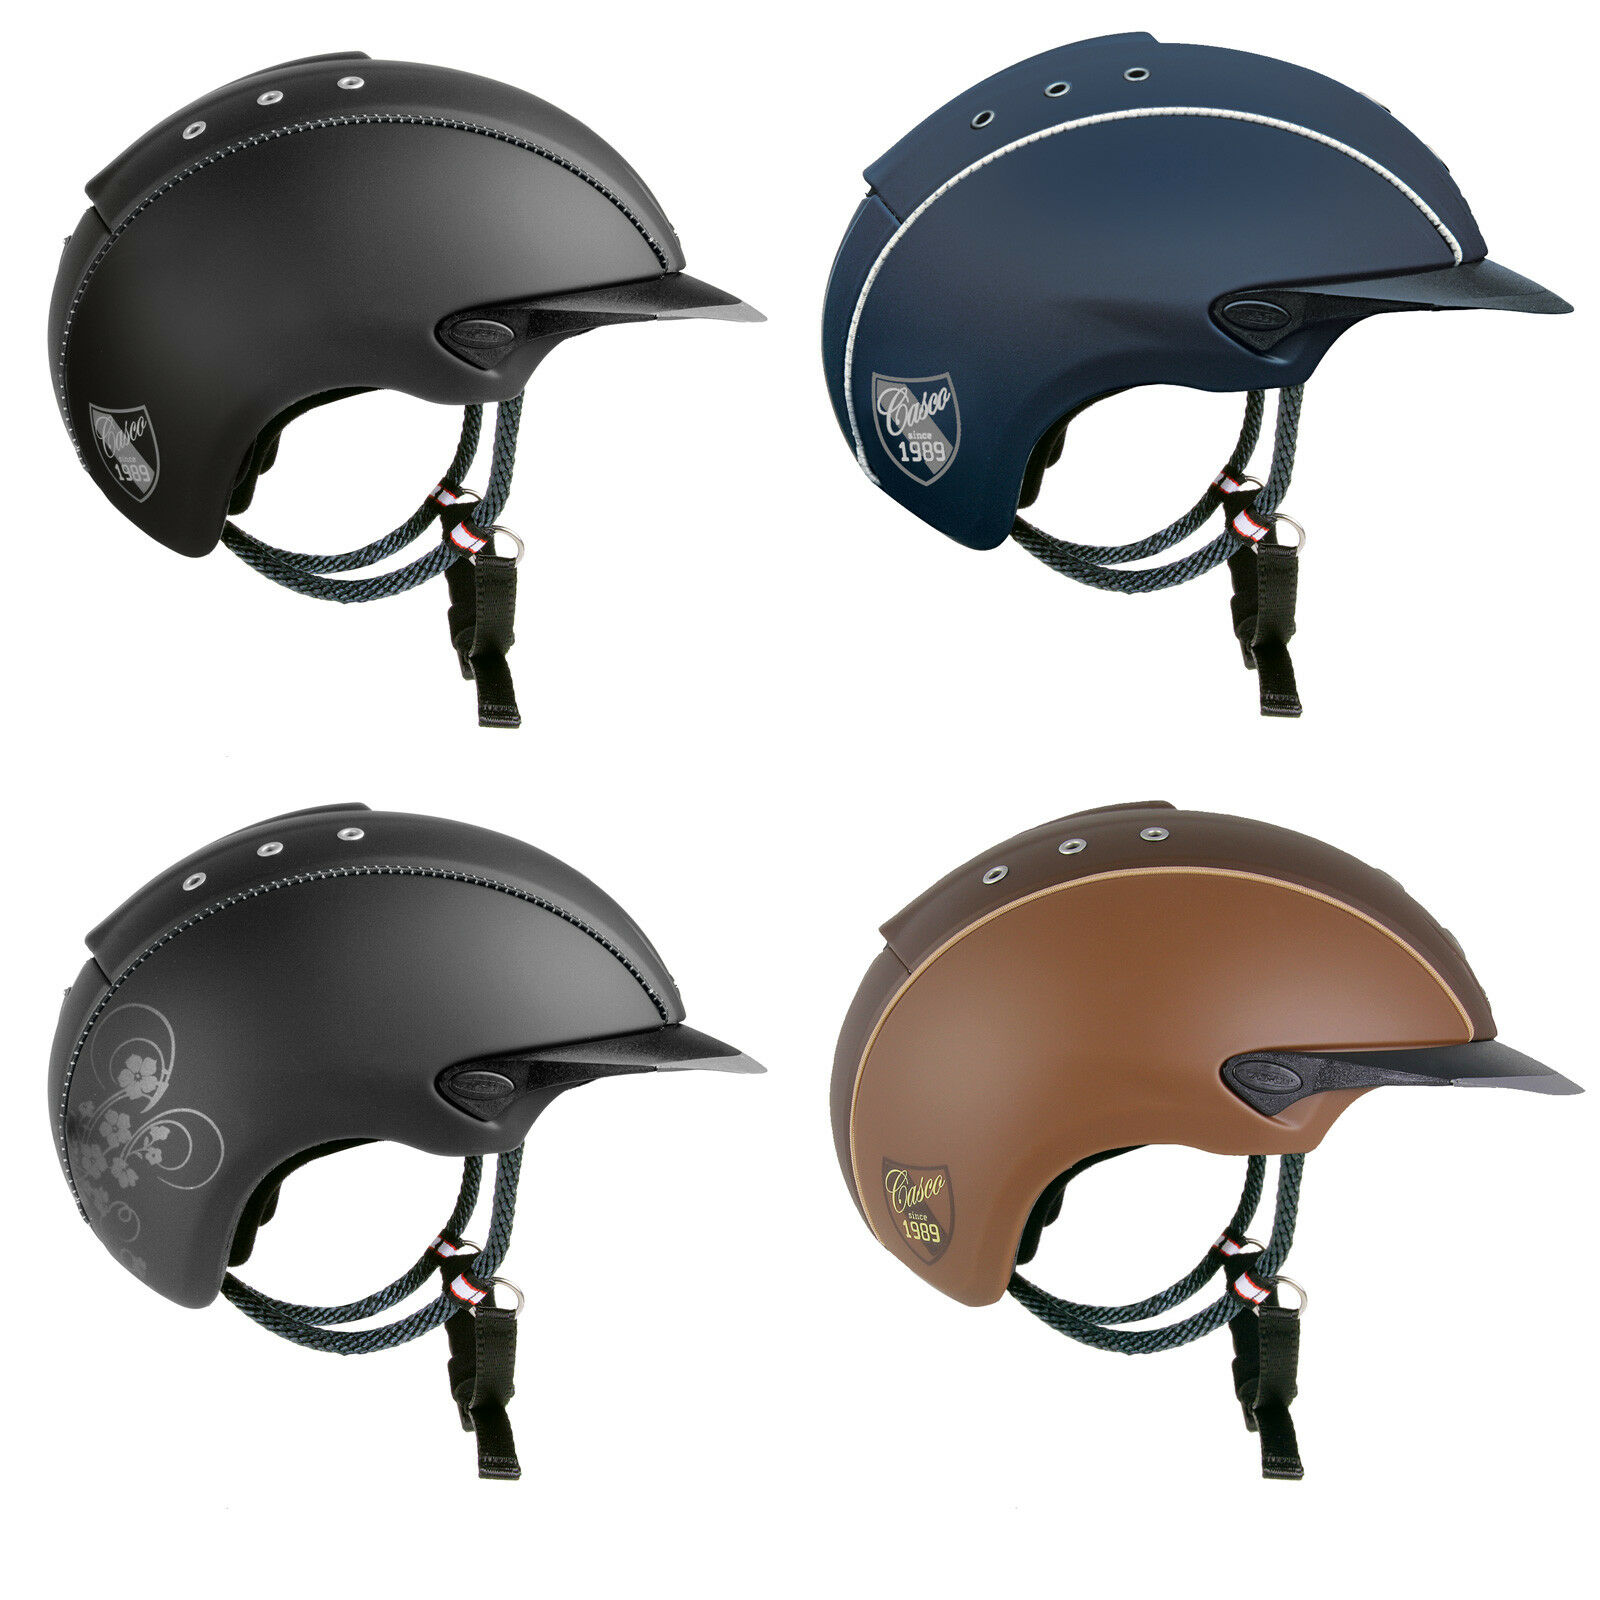 Casco Riding Helmet Mistrall, vg01